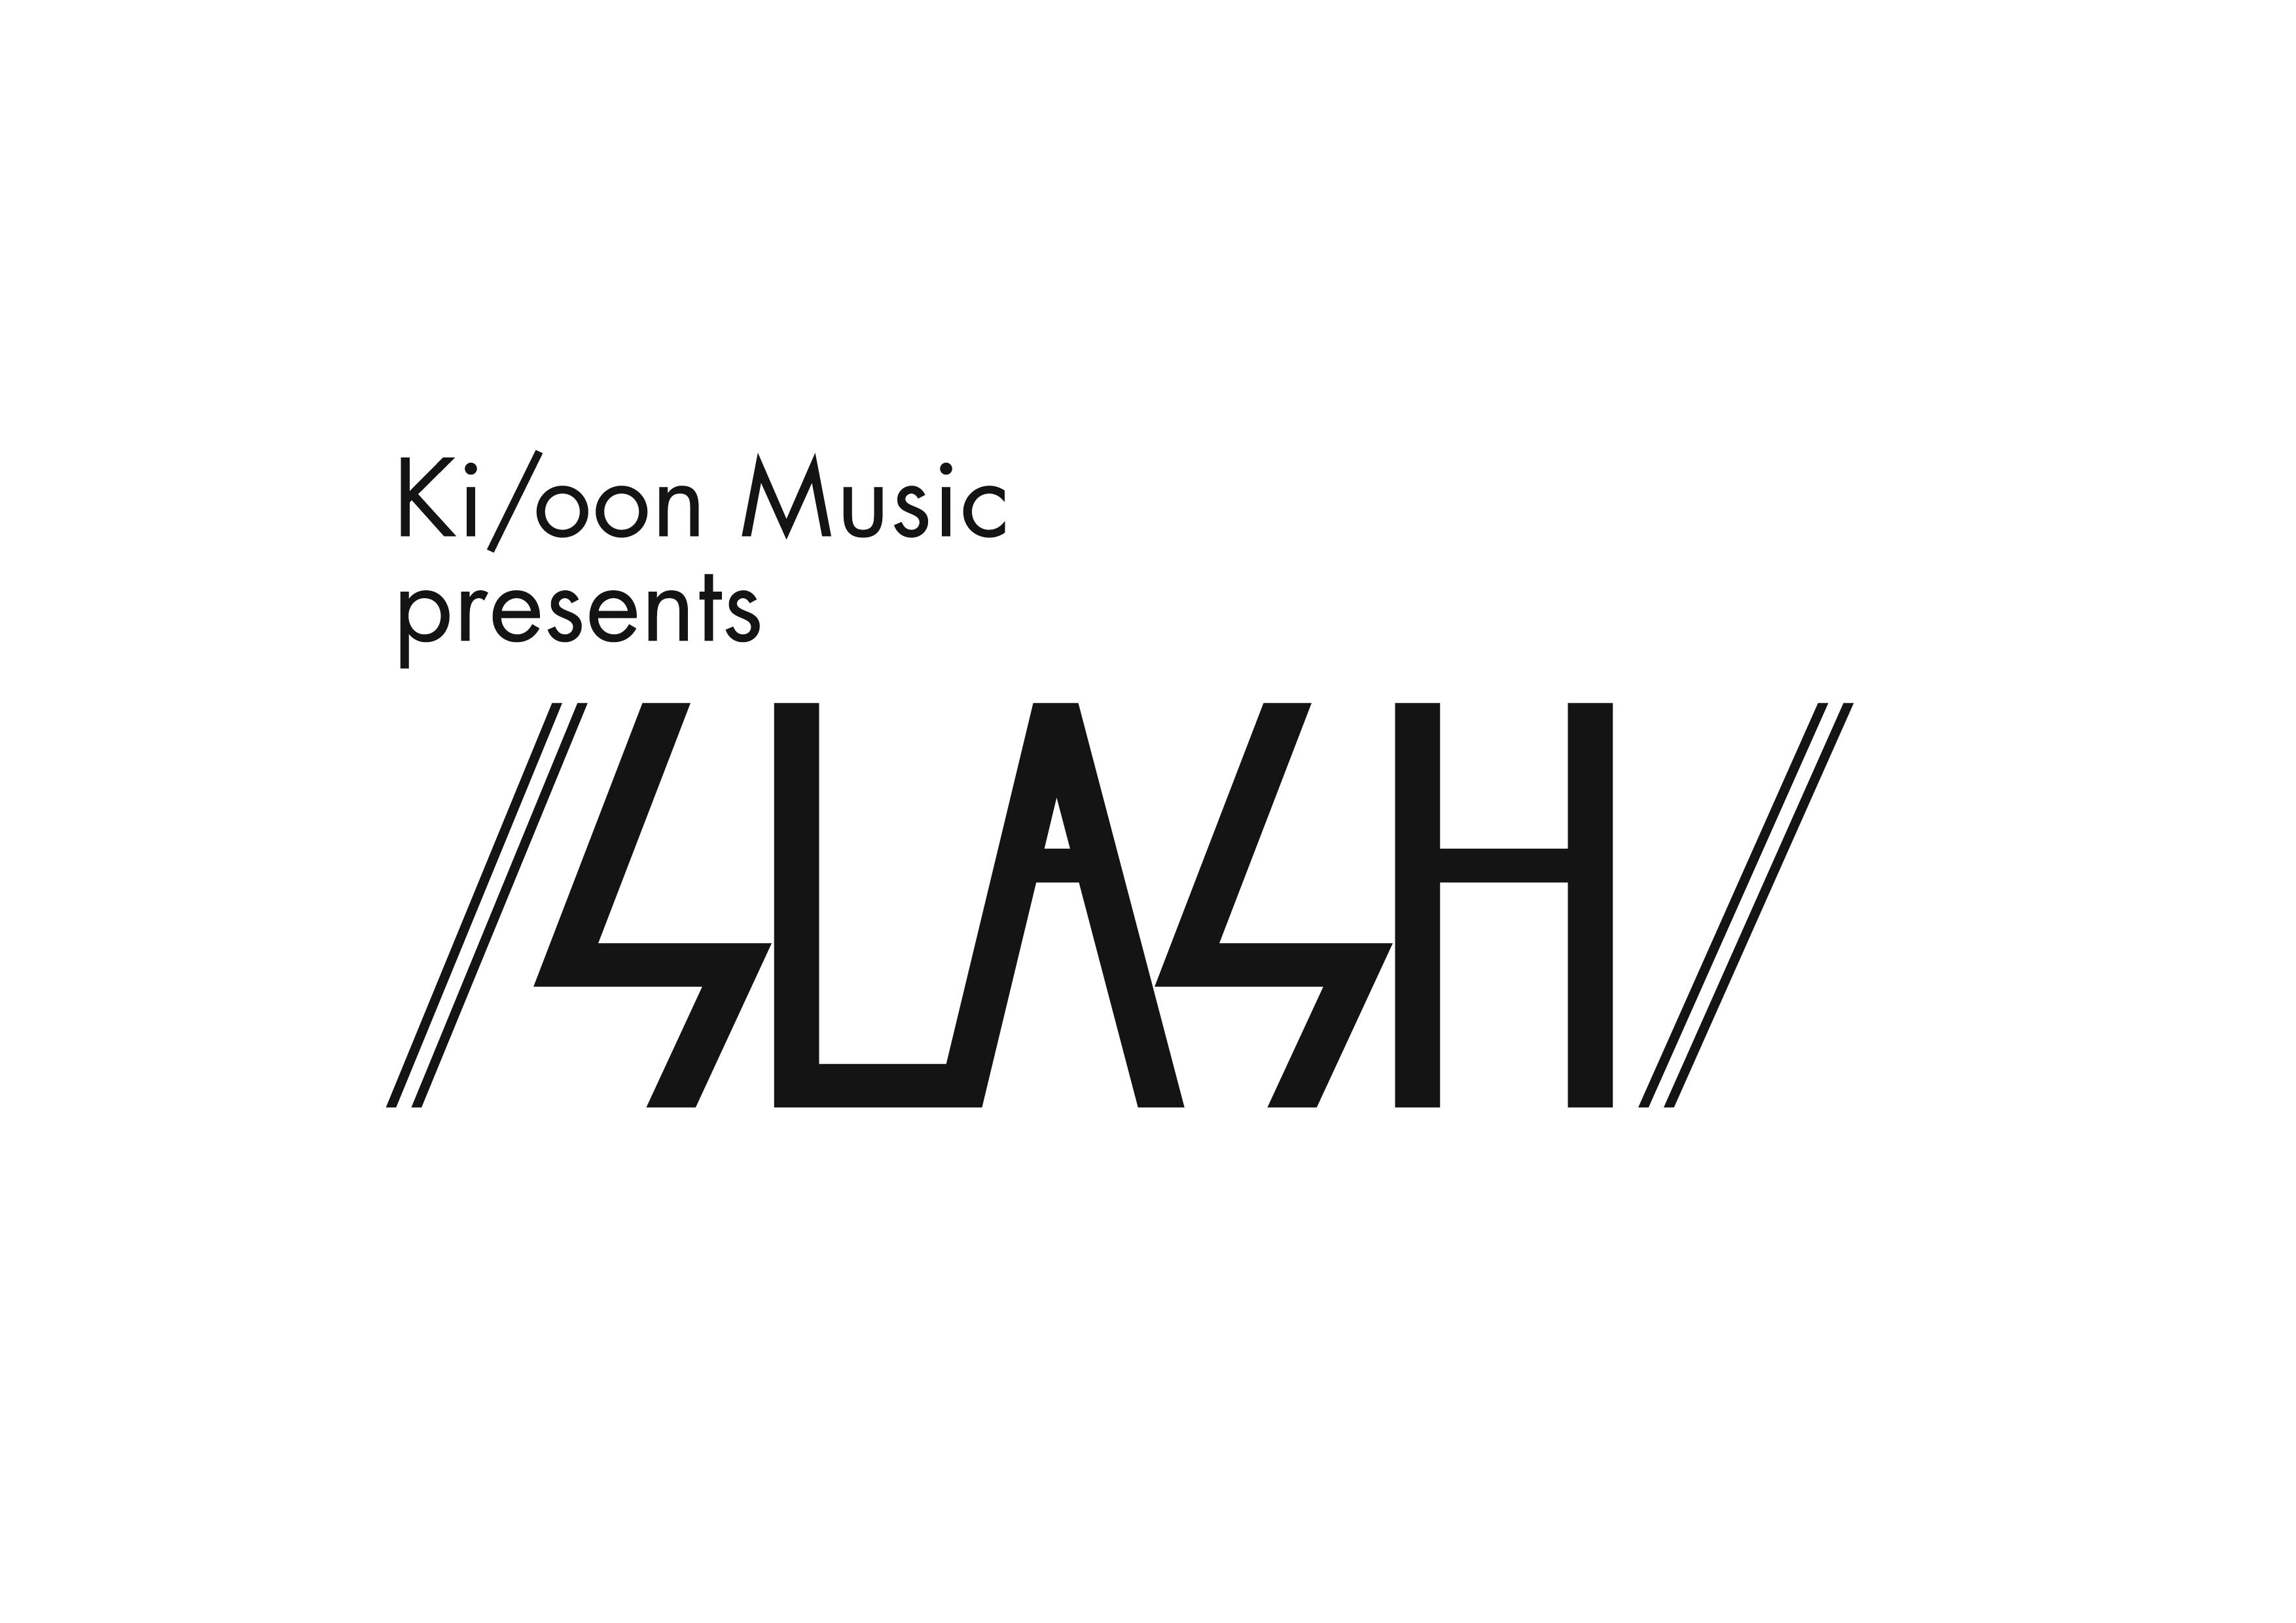 KANA-BOON、ブルエンら出演! キューン主催イベント「/ SLASH /」開催